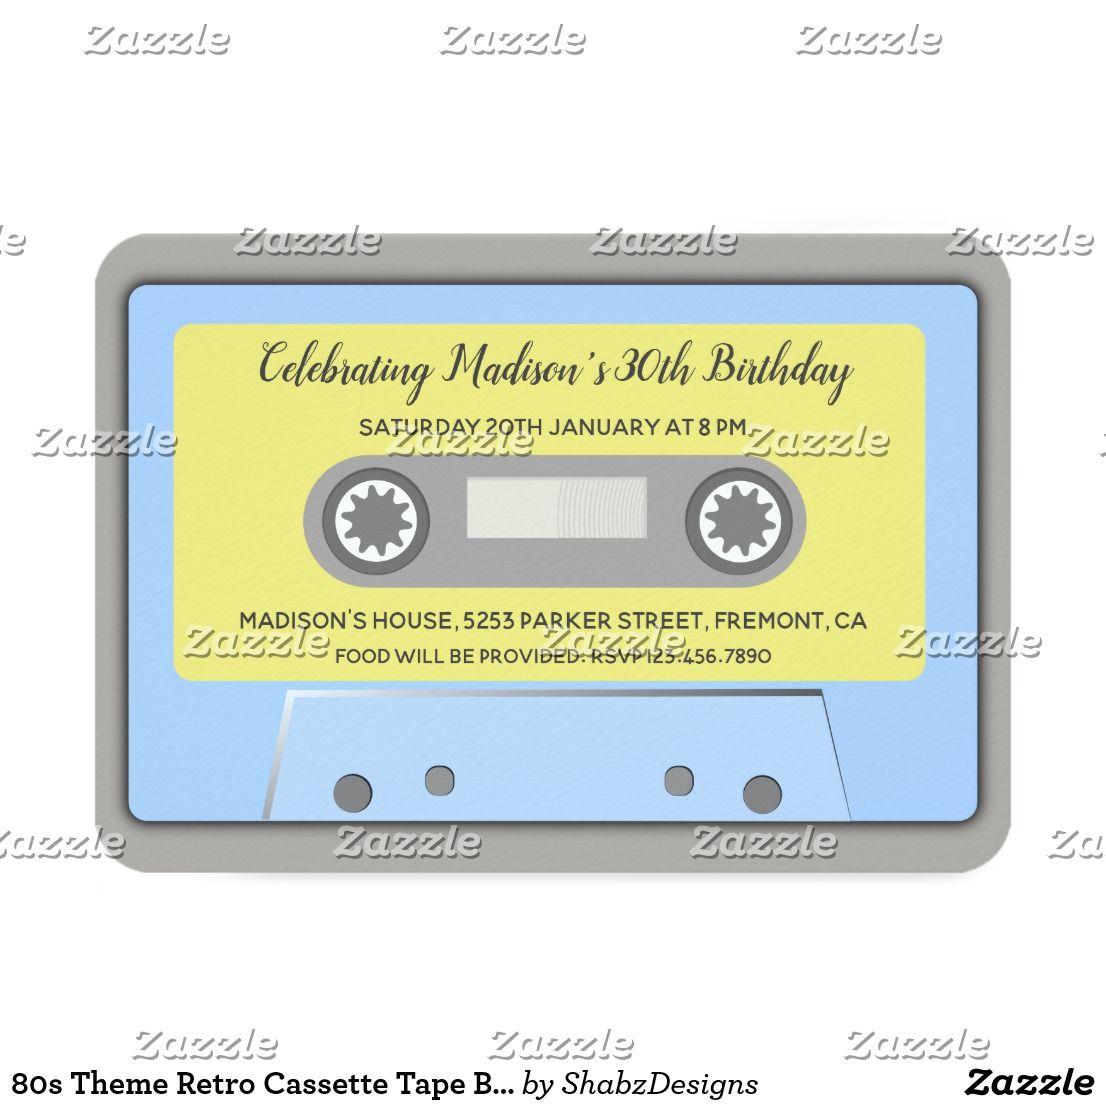 80s Theme Retro Cassette Tape Birthday Invitation Zazzle Com Retro Birthday Parties Bbq Baby Shower Invitations Invitation Template